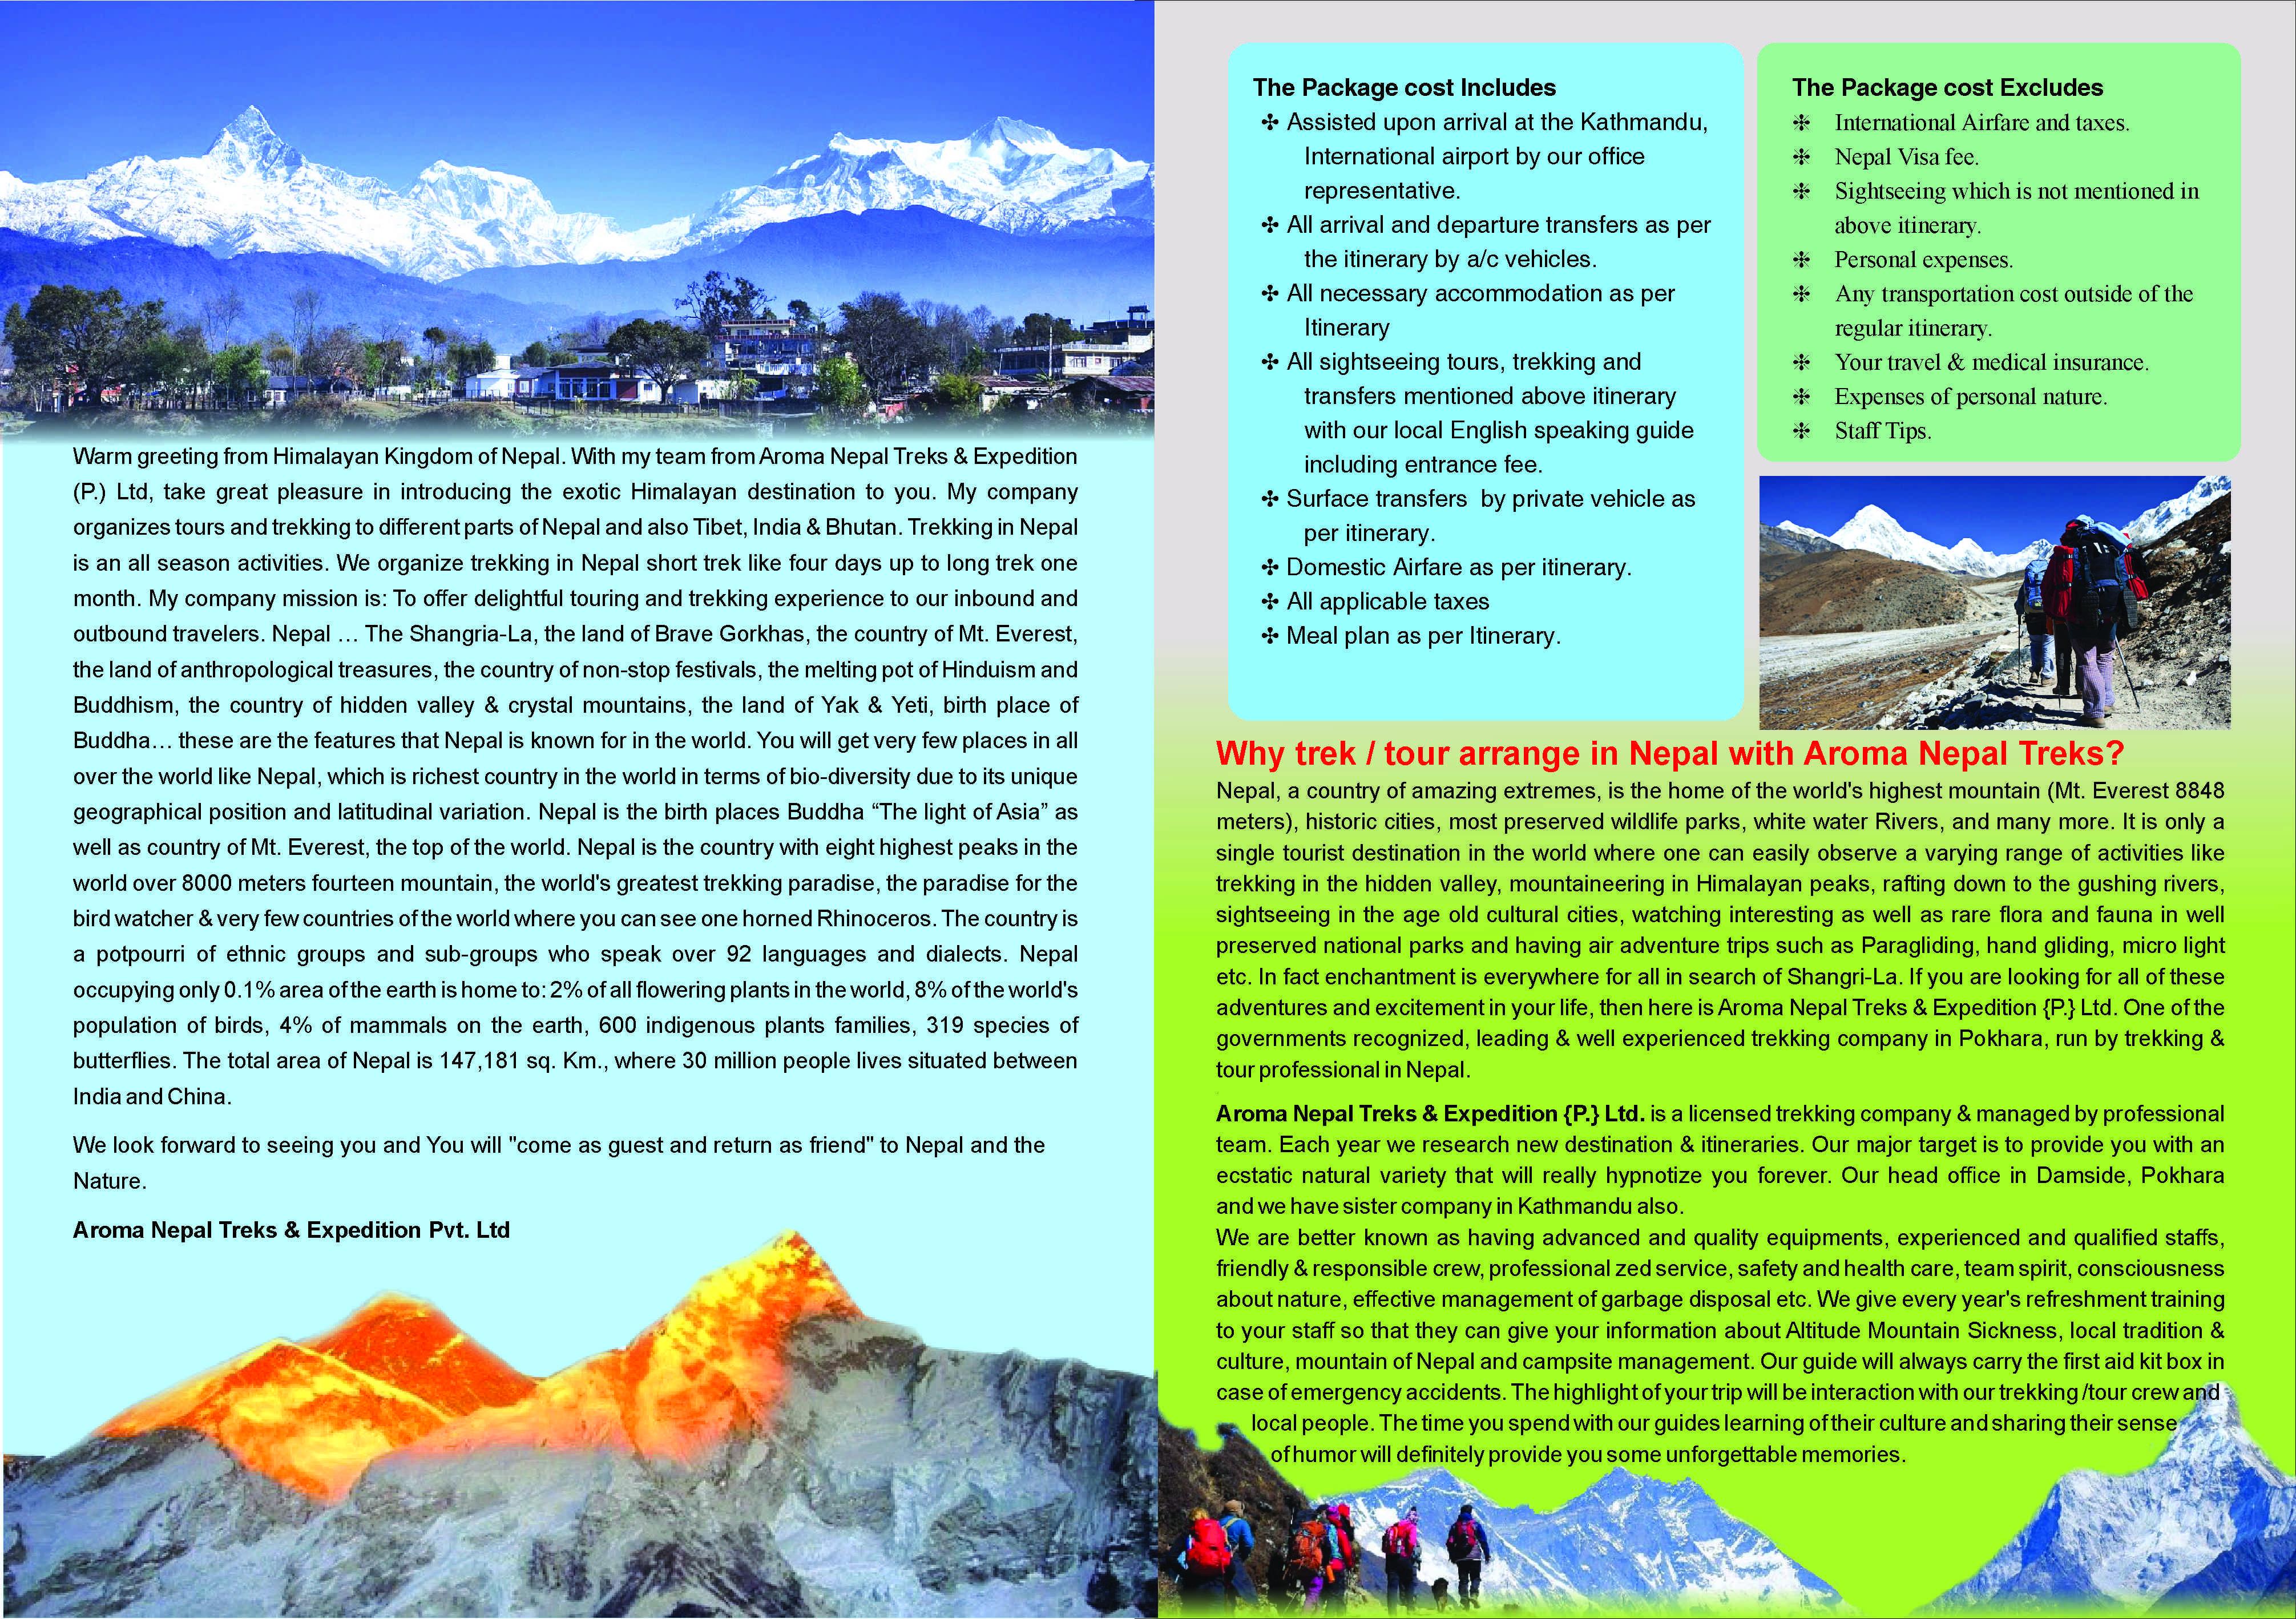 Nepal - Your Next Holidays Destination with Aroma Nepal